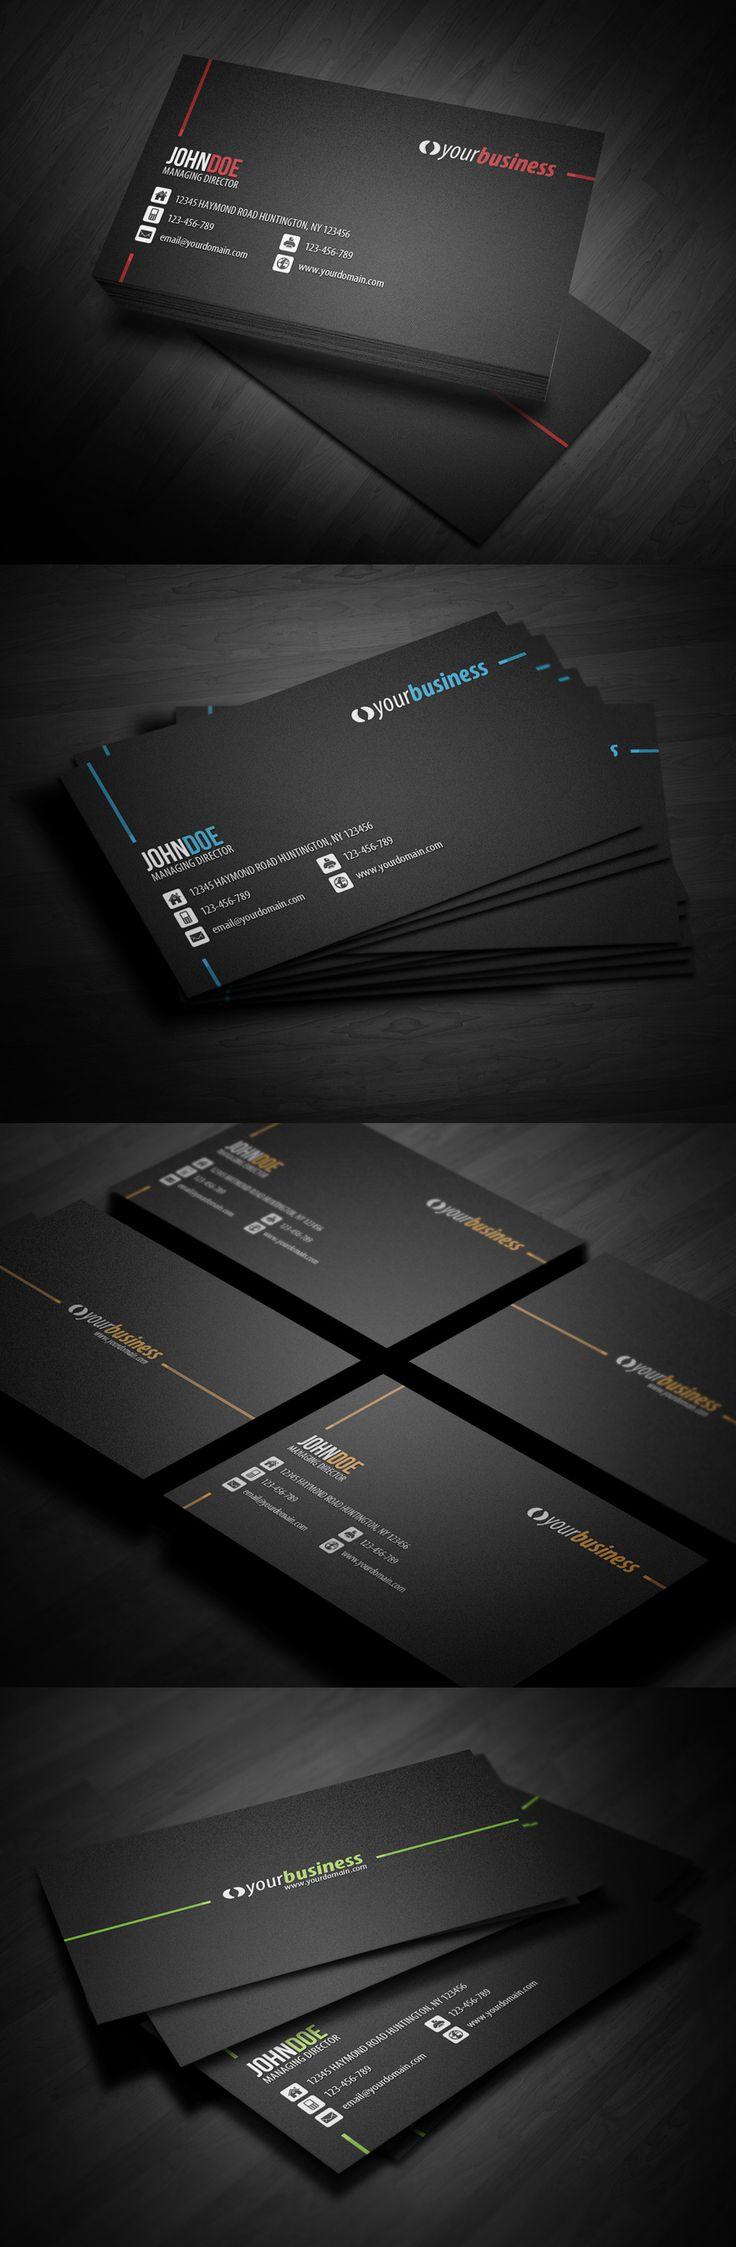 Line Corporate Business Card by glenngoh.deviantart.com on @deviantART